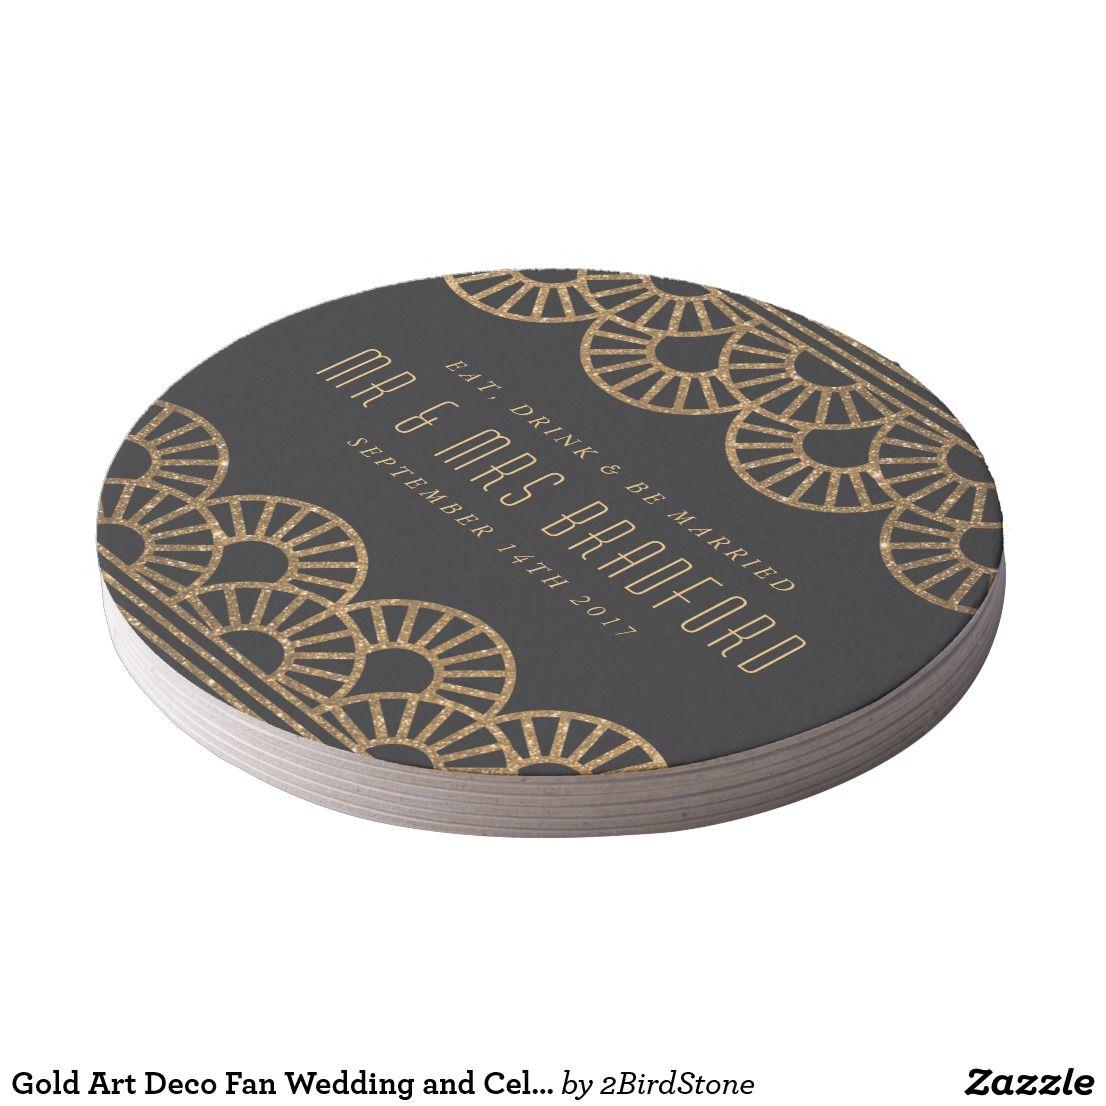 Gold art deco fan wedding and celebration coasters youure